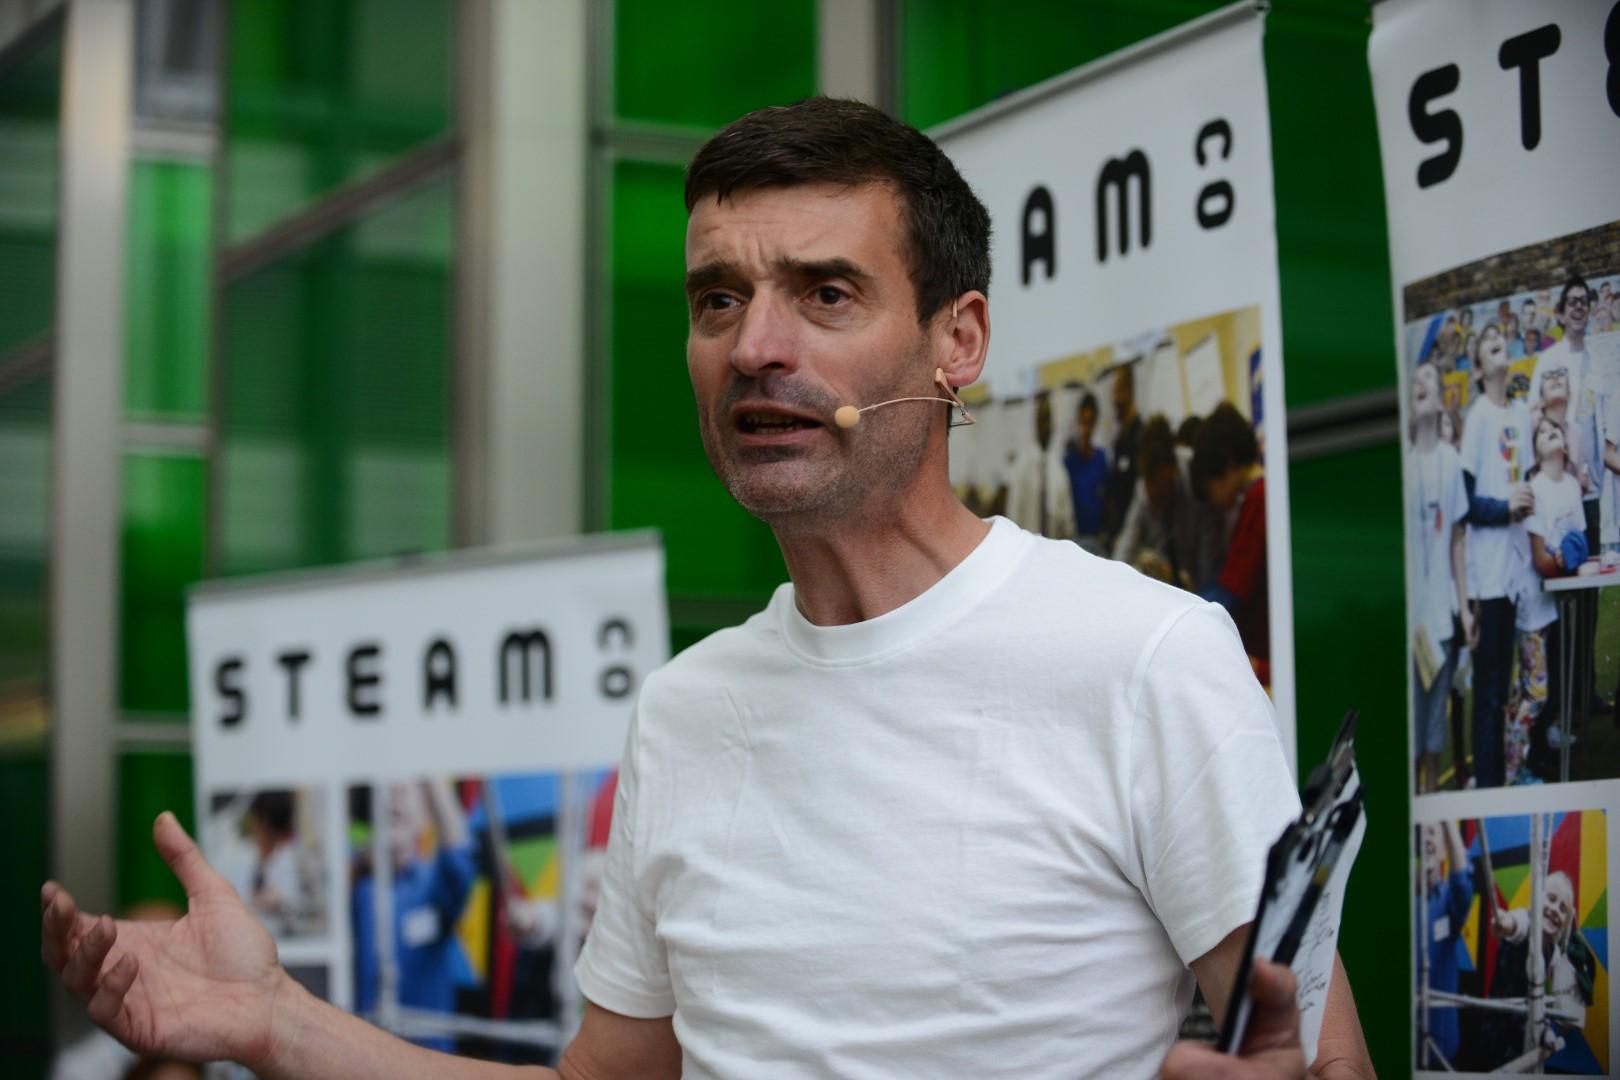 Nick Corston Co-founder STEAM Co speaking.jpg